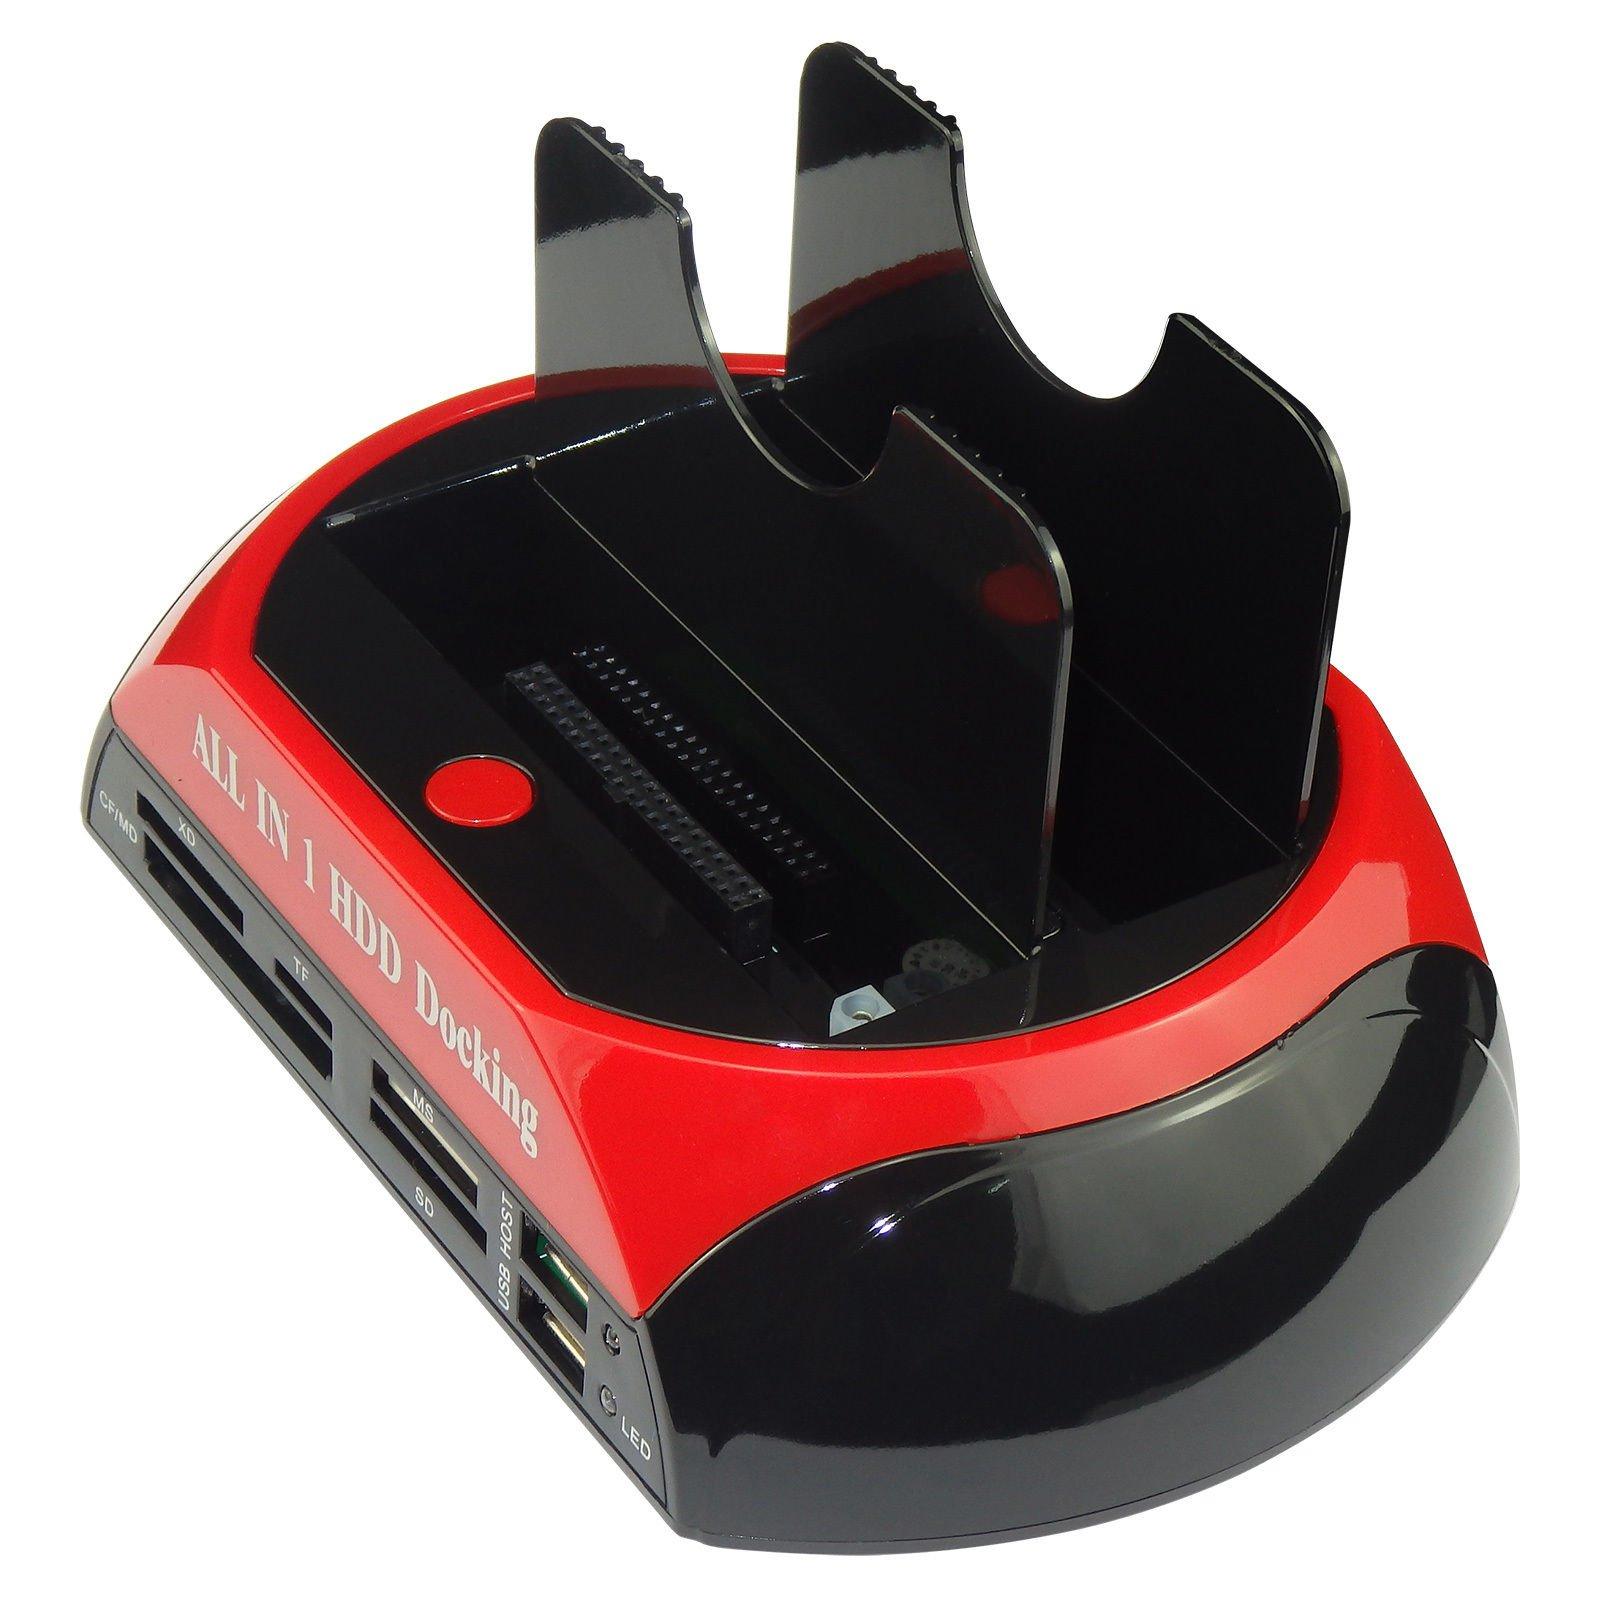 SATKIT Base Dock Doble para Discos Duros HDD IDE/SATA 2, 5 3, 5 A USB 2. 0 Caja Externa HUB Lector Tarjetas: Amazon.es: Electrónica